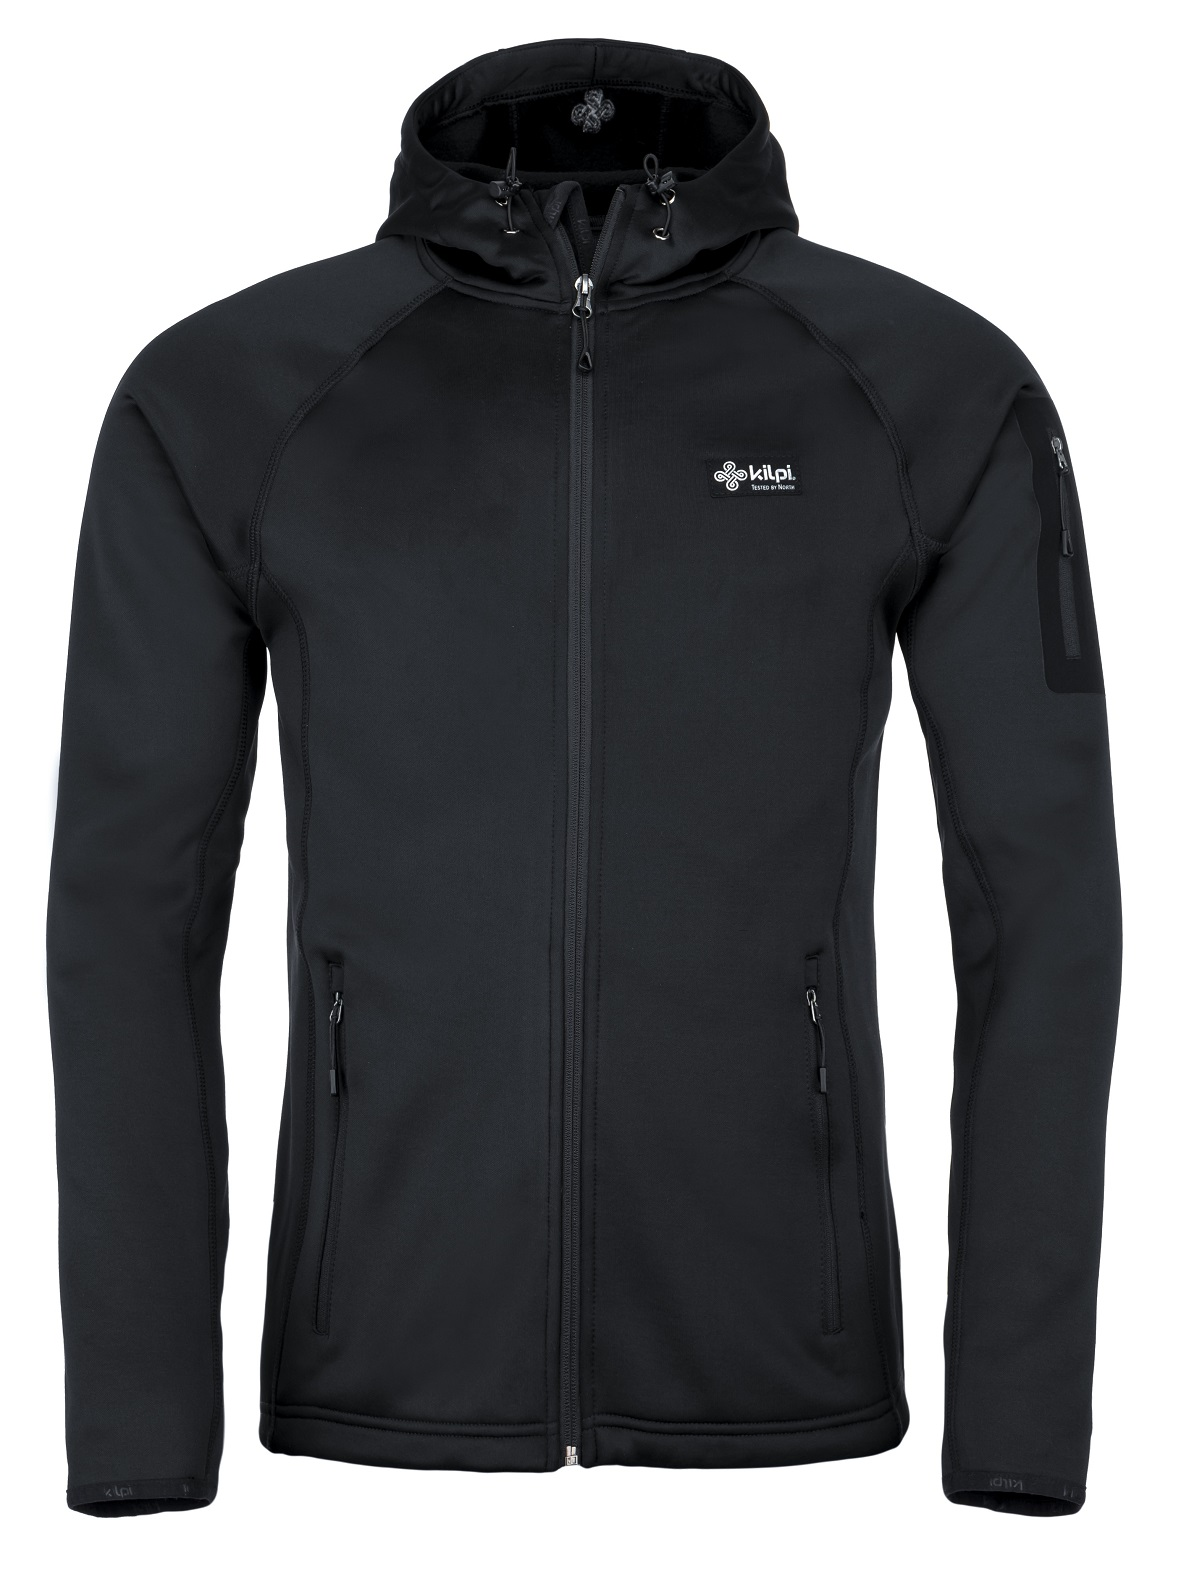 Men's fleece sweatshirt Kilpi YOHO-M